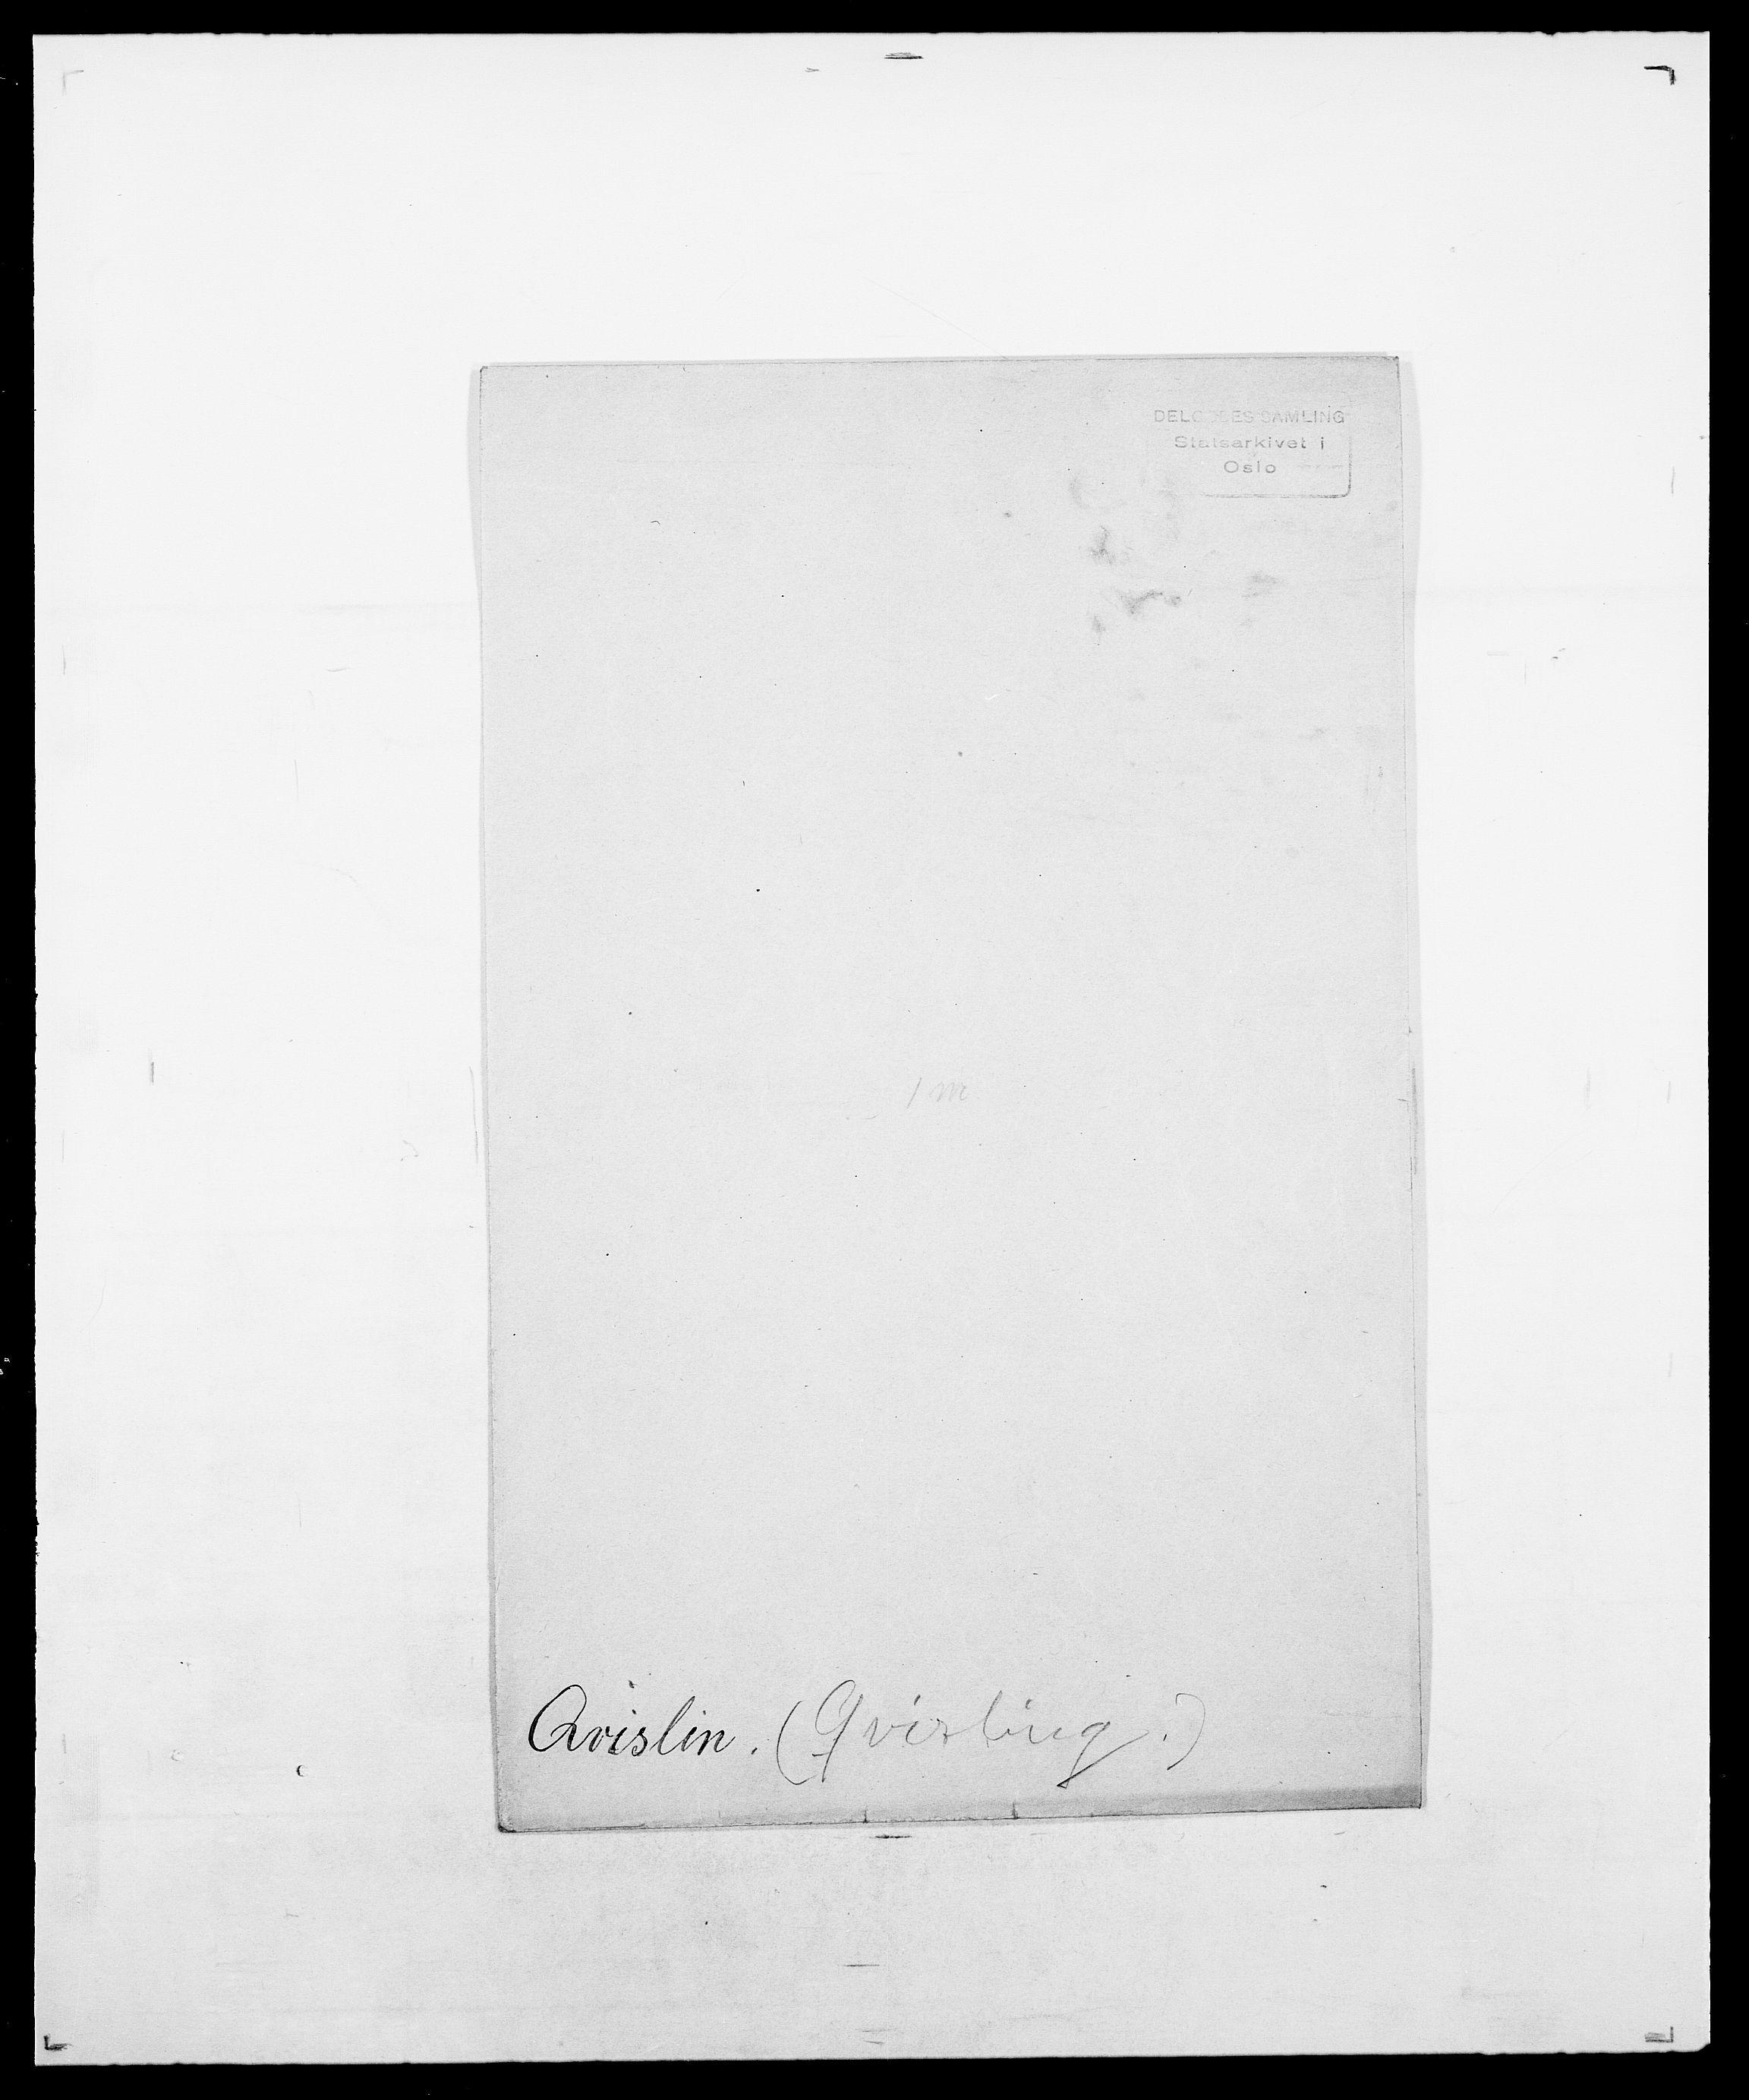 SAO, Delgobe, Charles Antoine - samling, D/Da/L0031: de Place - Raaum, s. 506